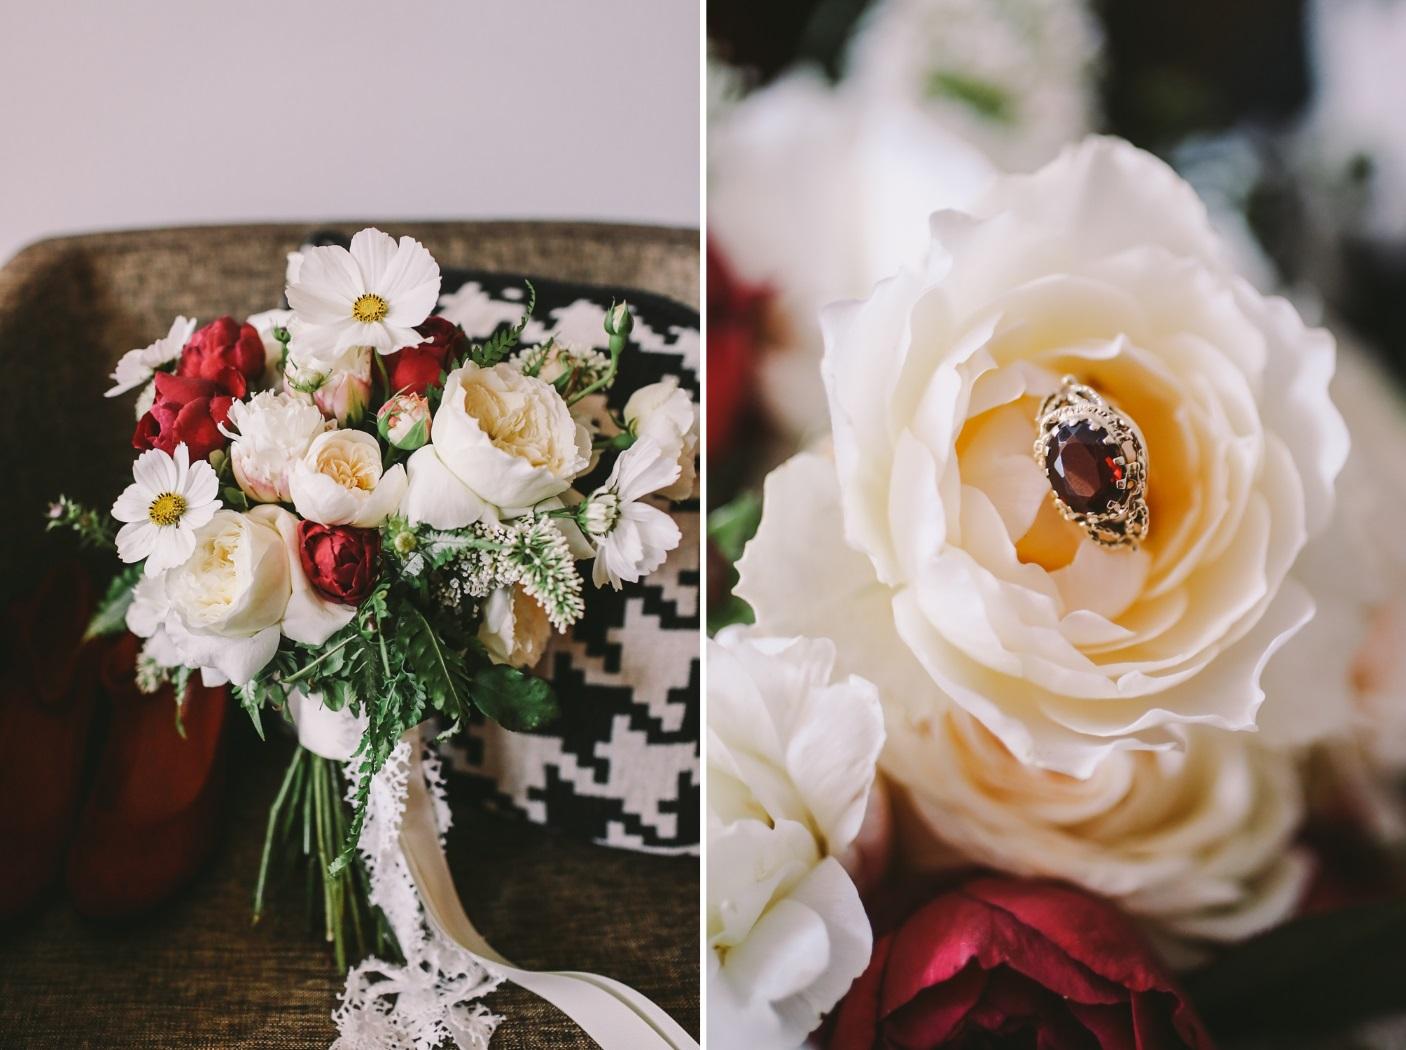 A Bold & Beautiful Vintage Inspired Wedding from Lara Hotz Photography